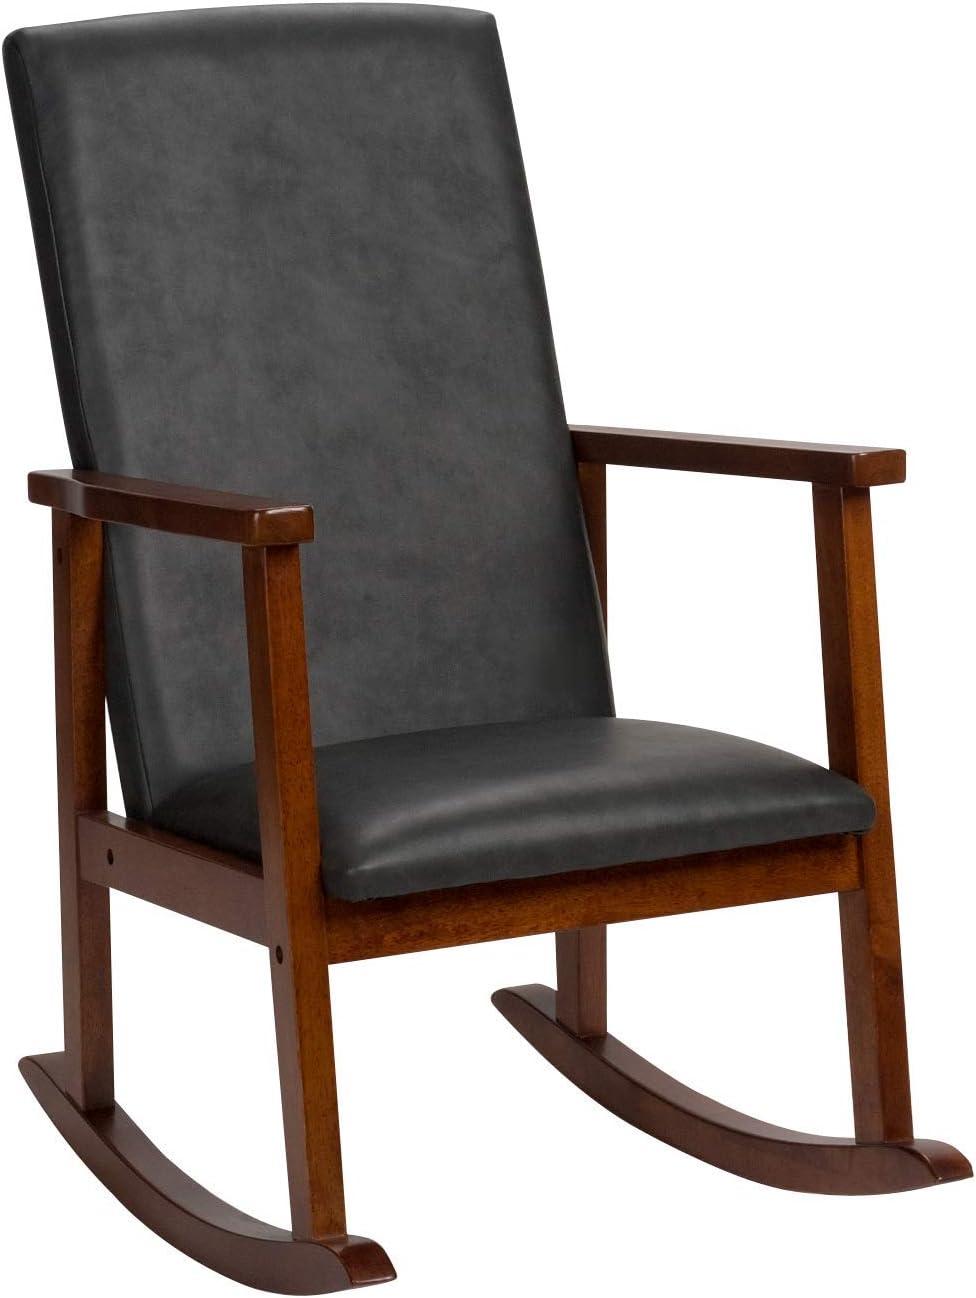 Elegant GiftMark Deluxe Childrens Chair Cherry New York Mall Rocking